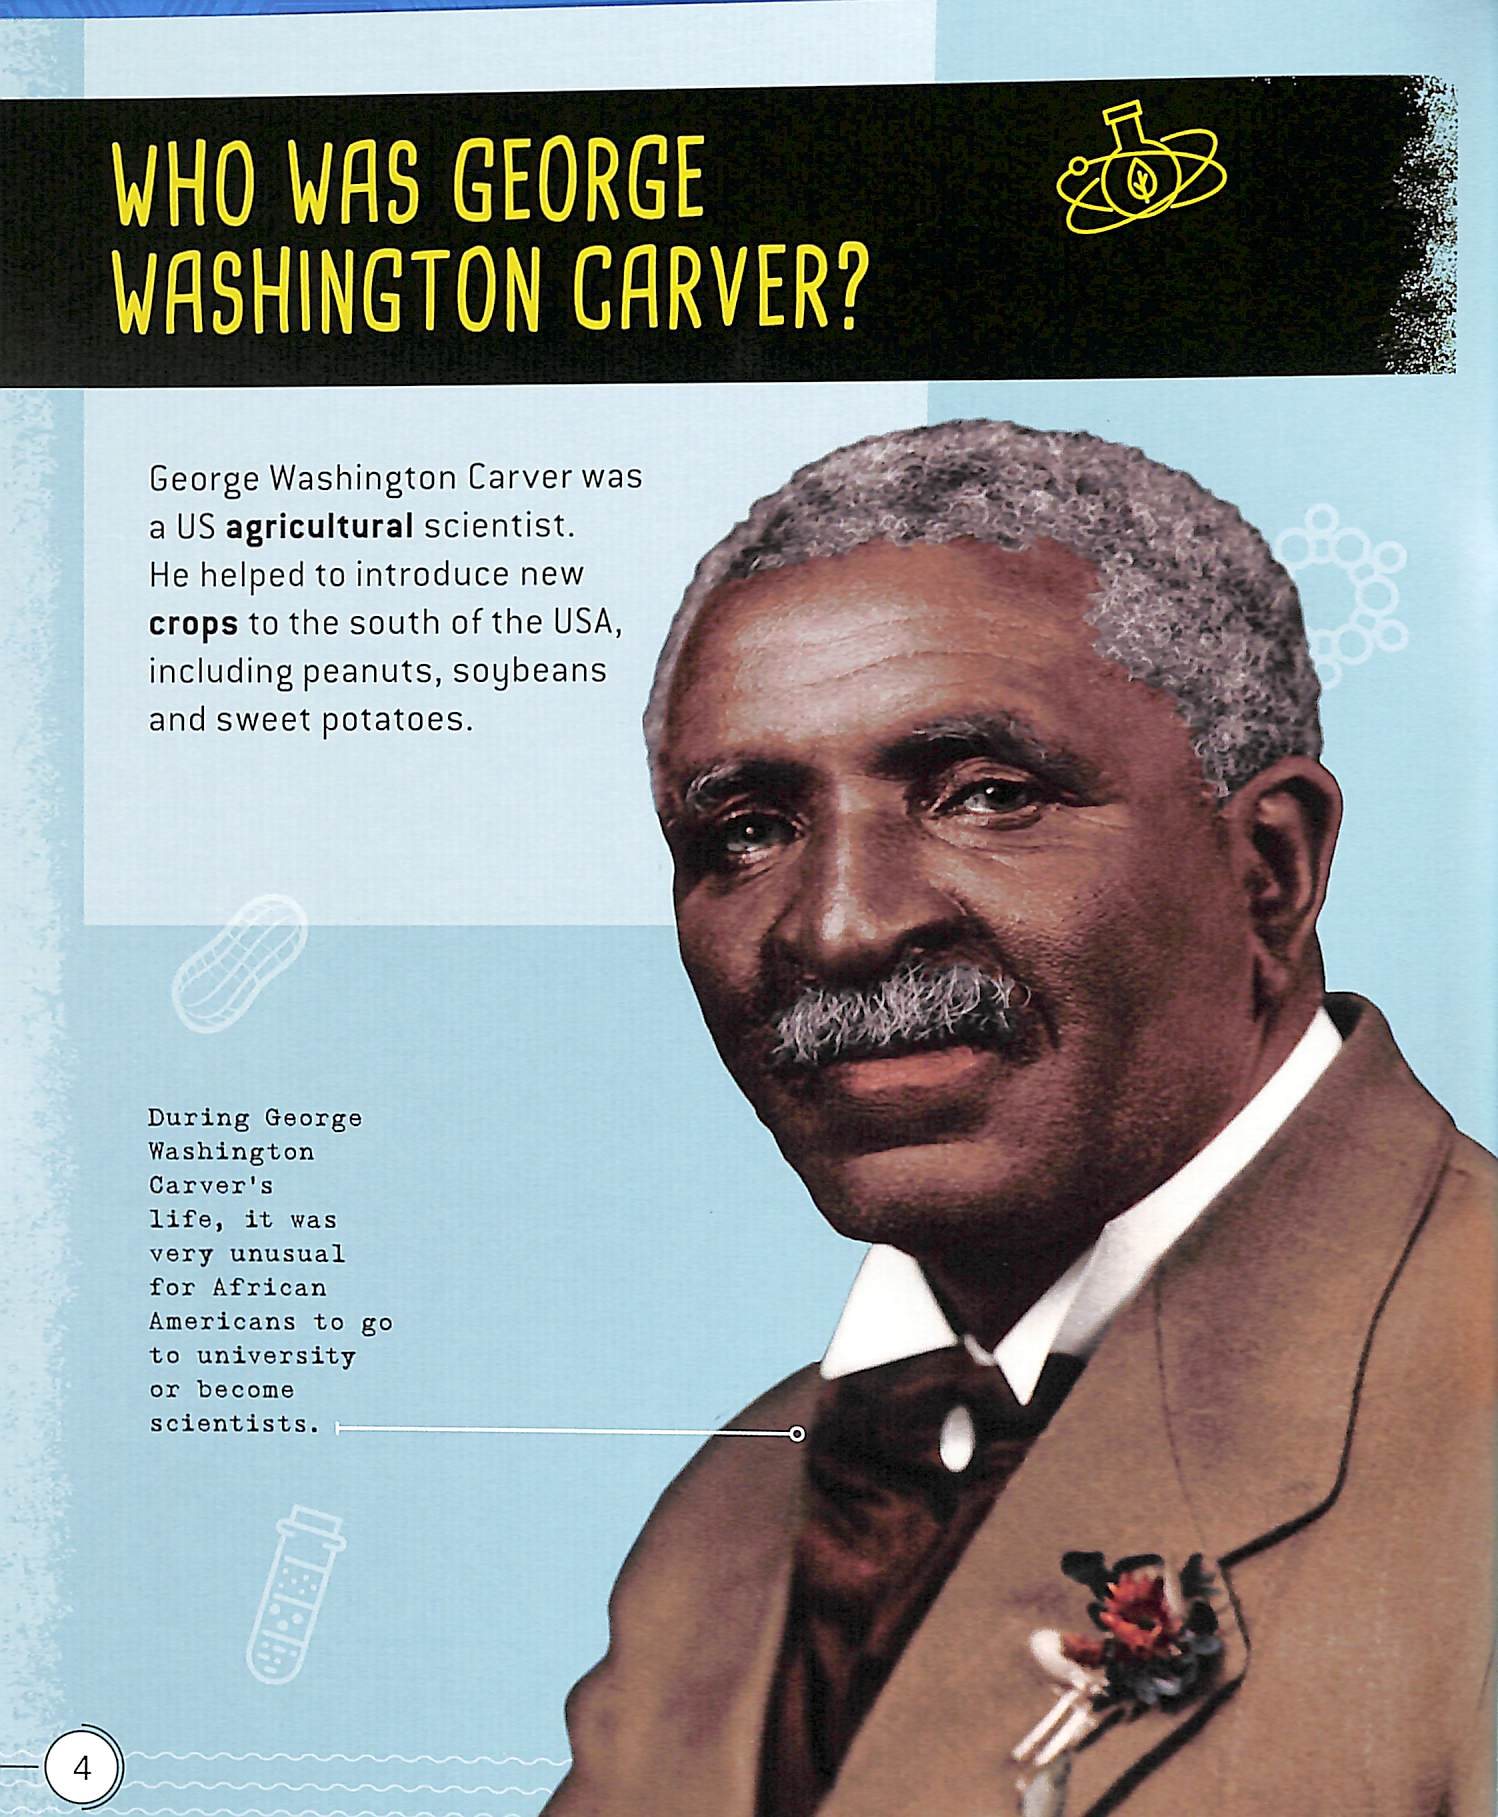 George Washington Carver By Howell Izzi